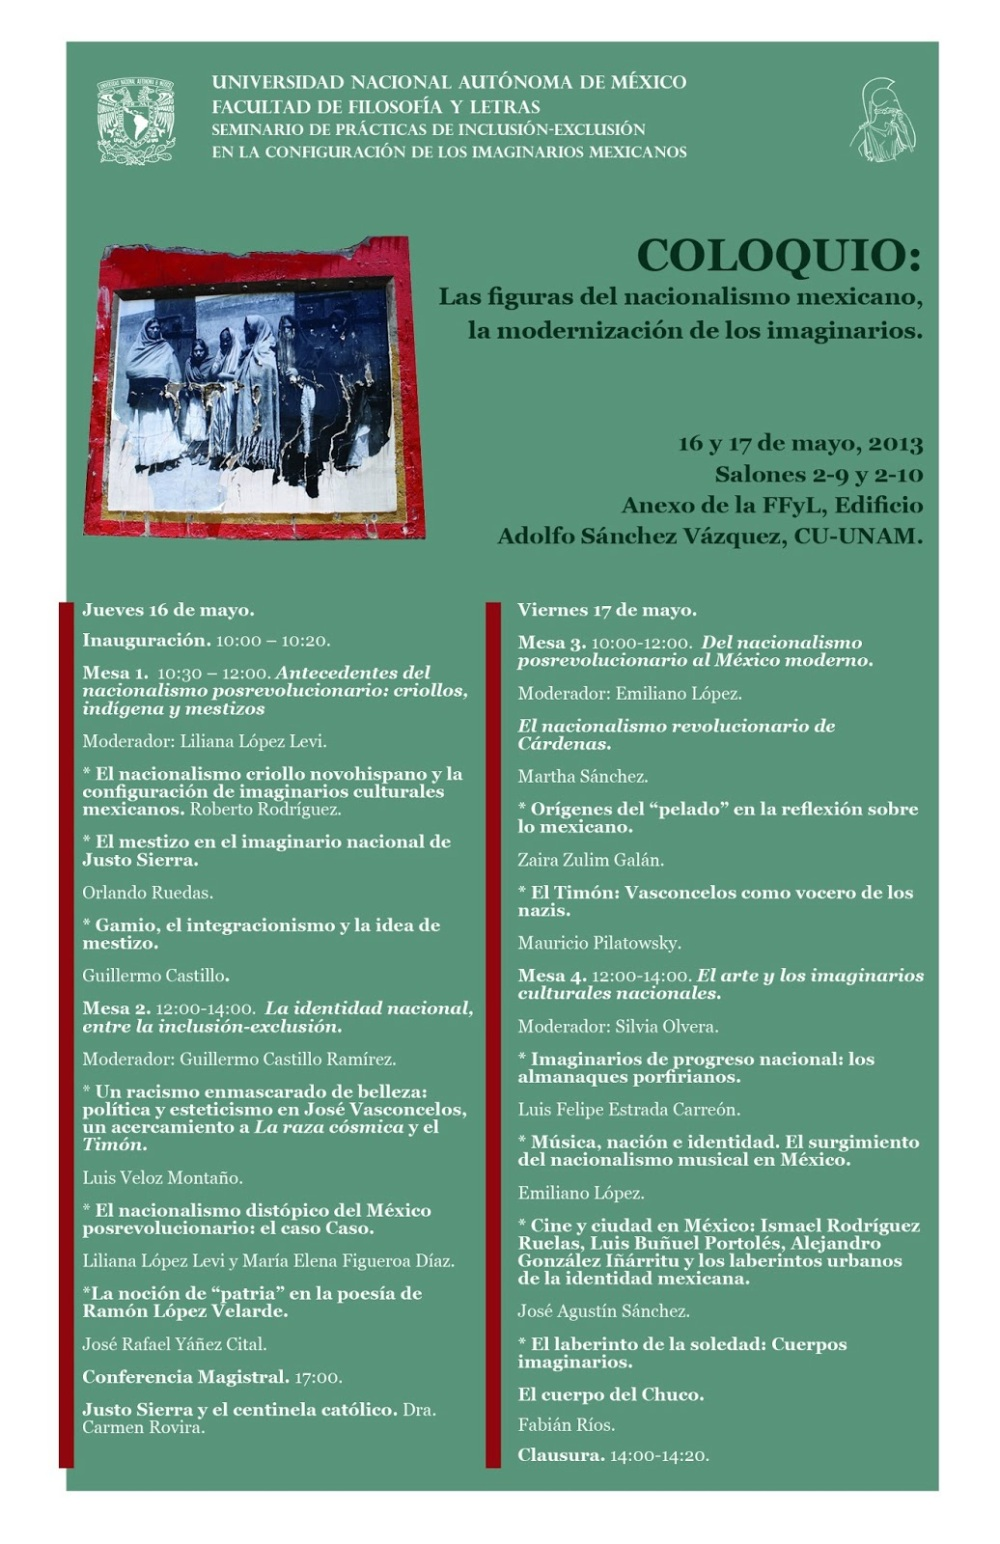 Coloquio Figuras del nacionalismo mexicano